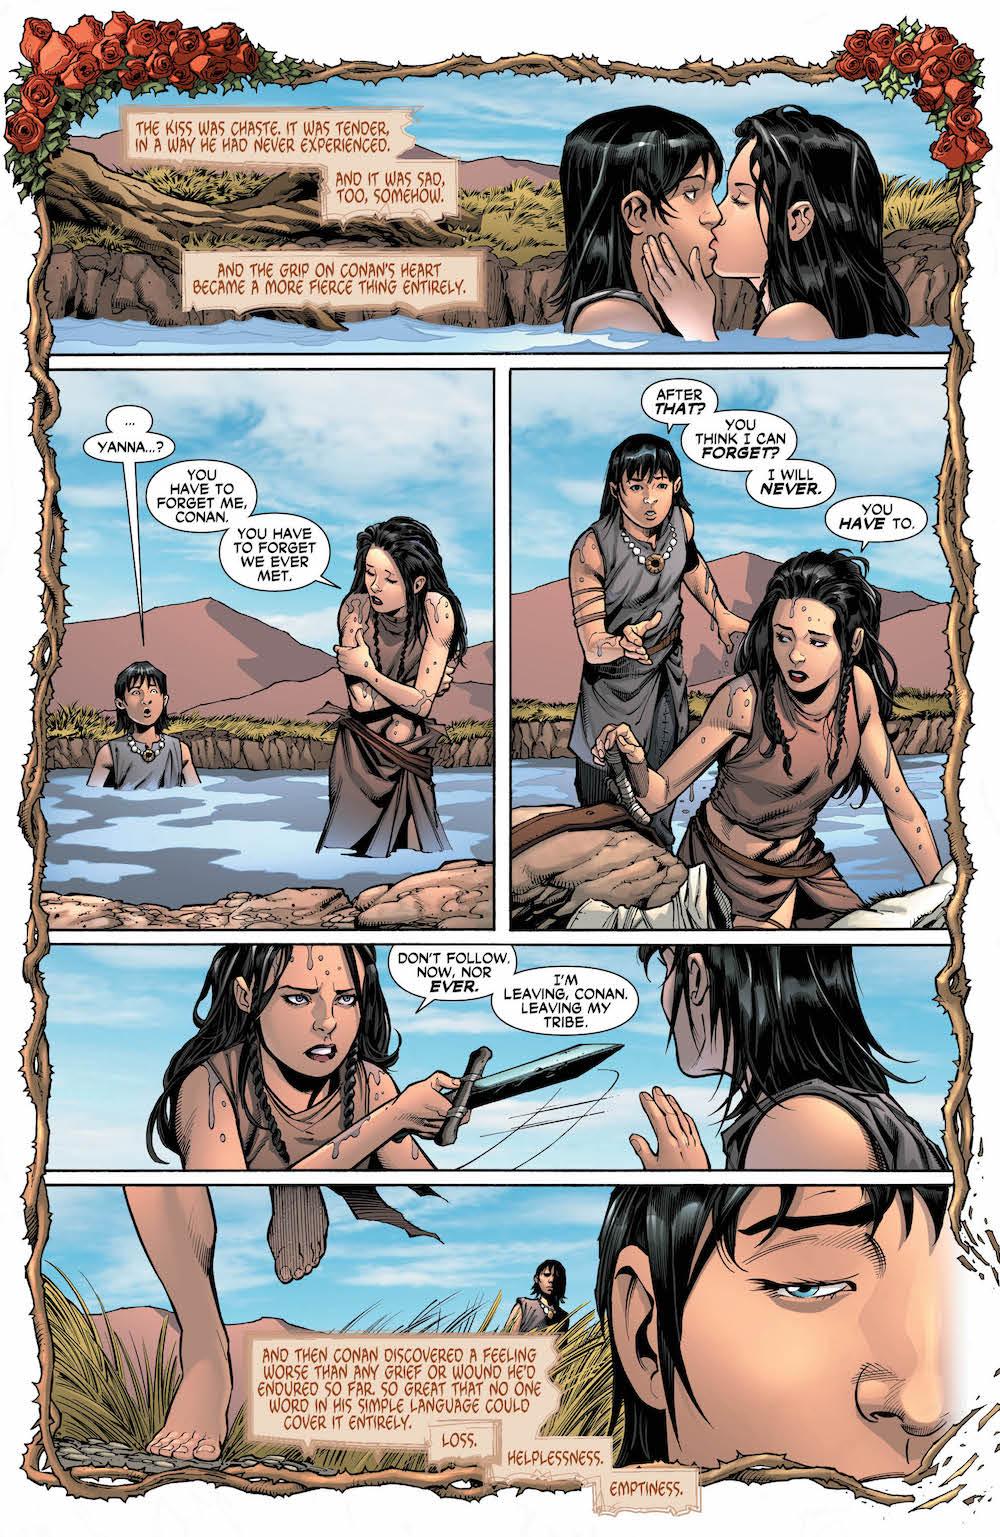 Wonder Woman/Conan #3 Diana and Conan